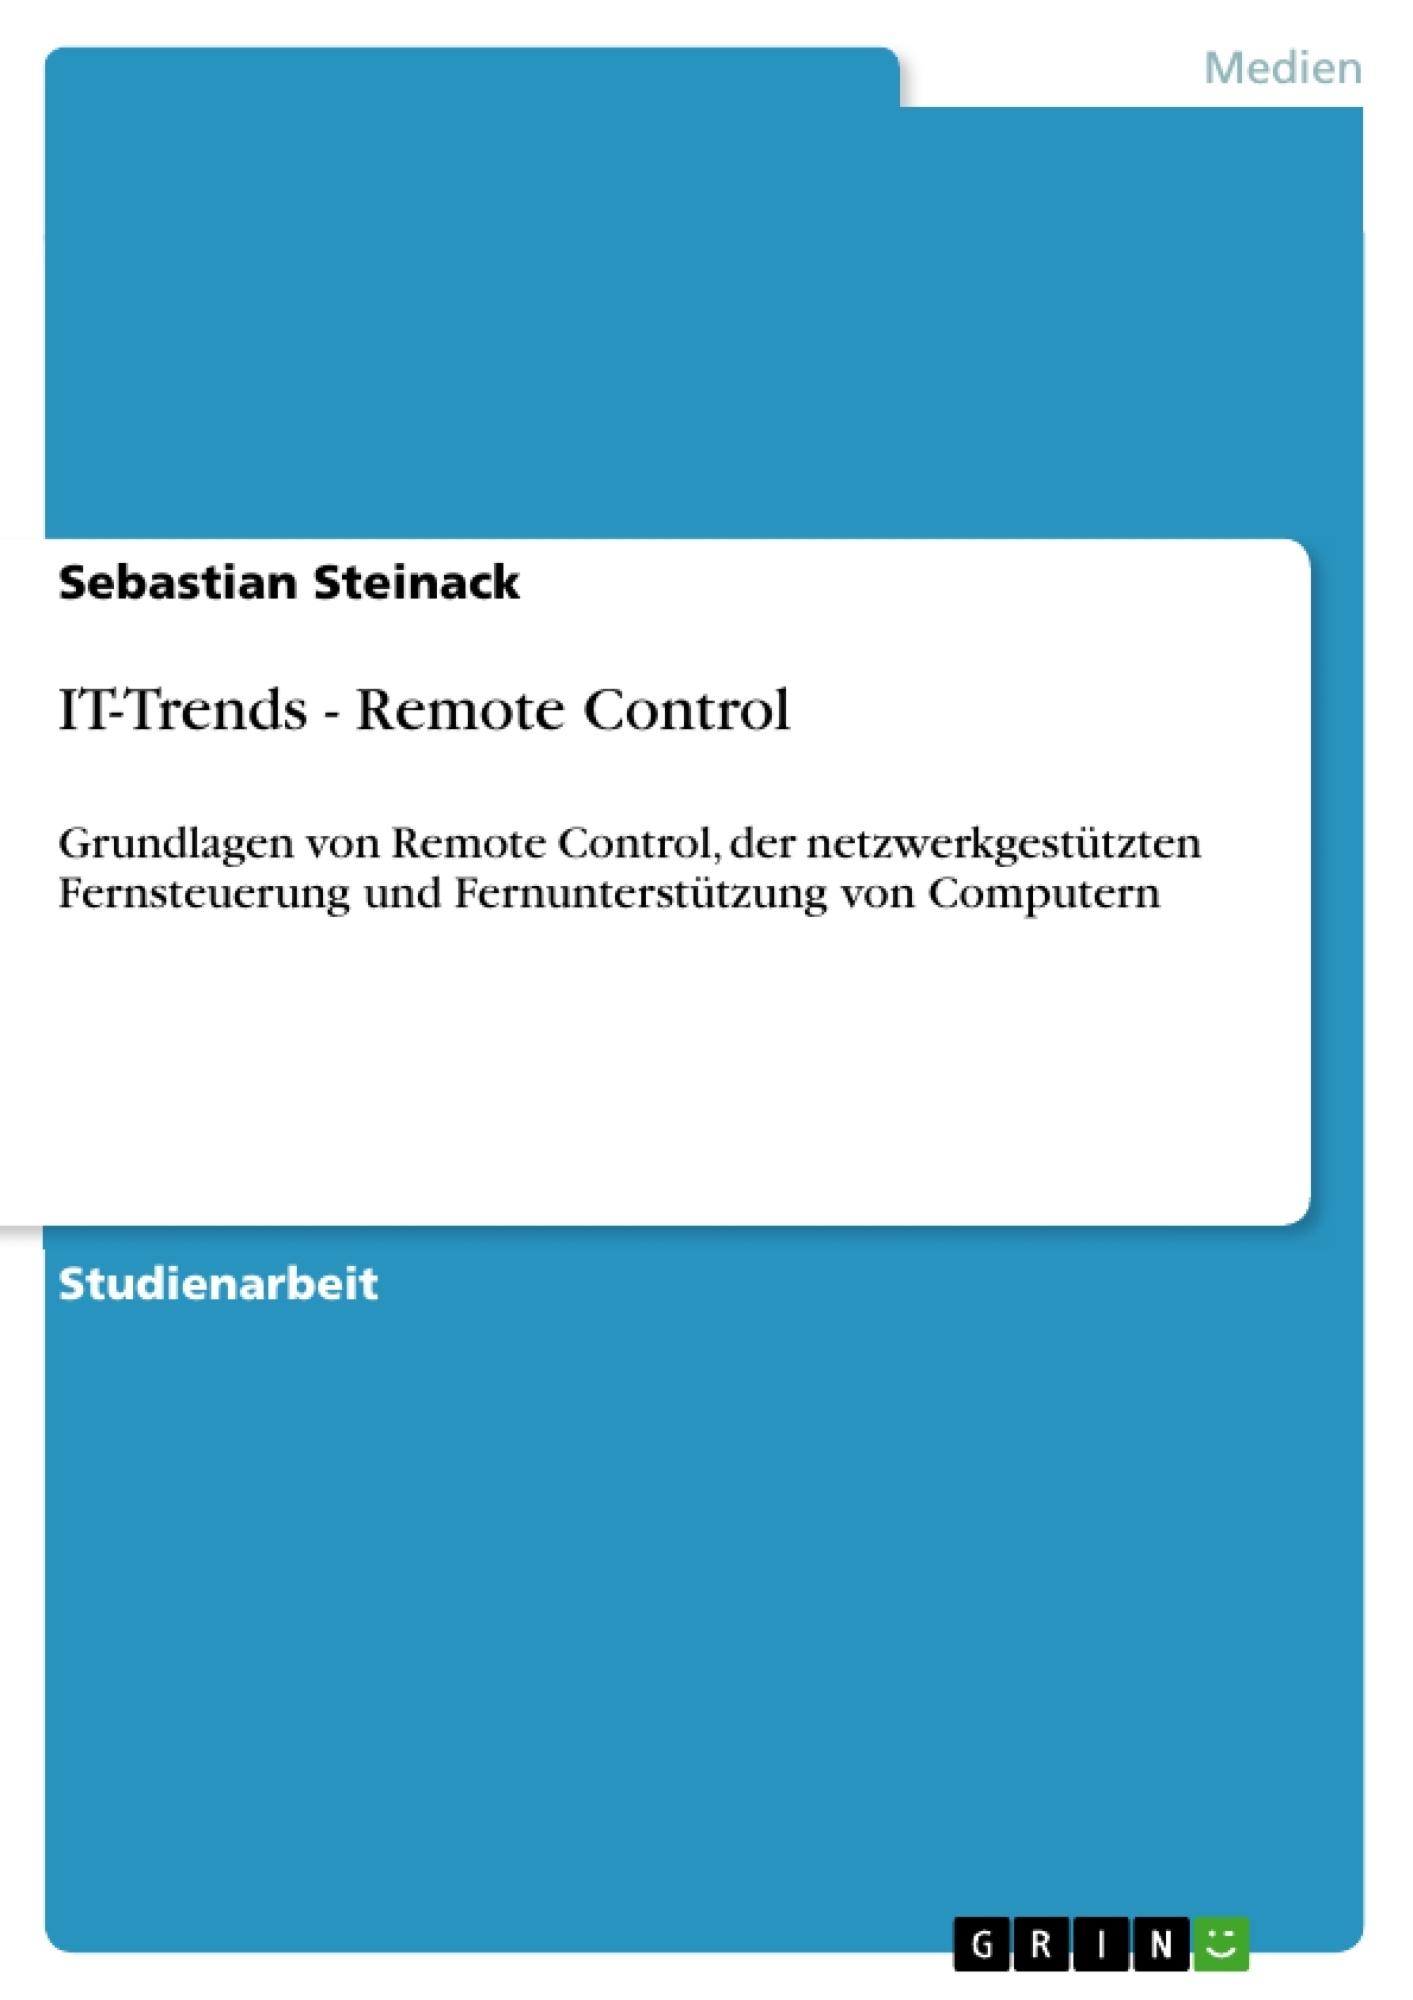 Titel: IT-Trends - Remote Control